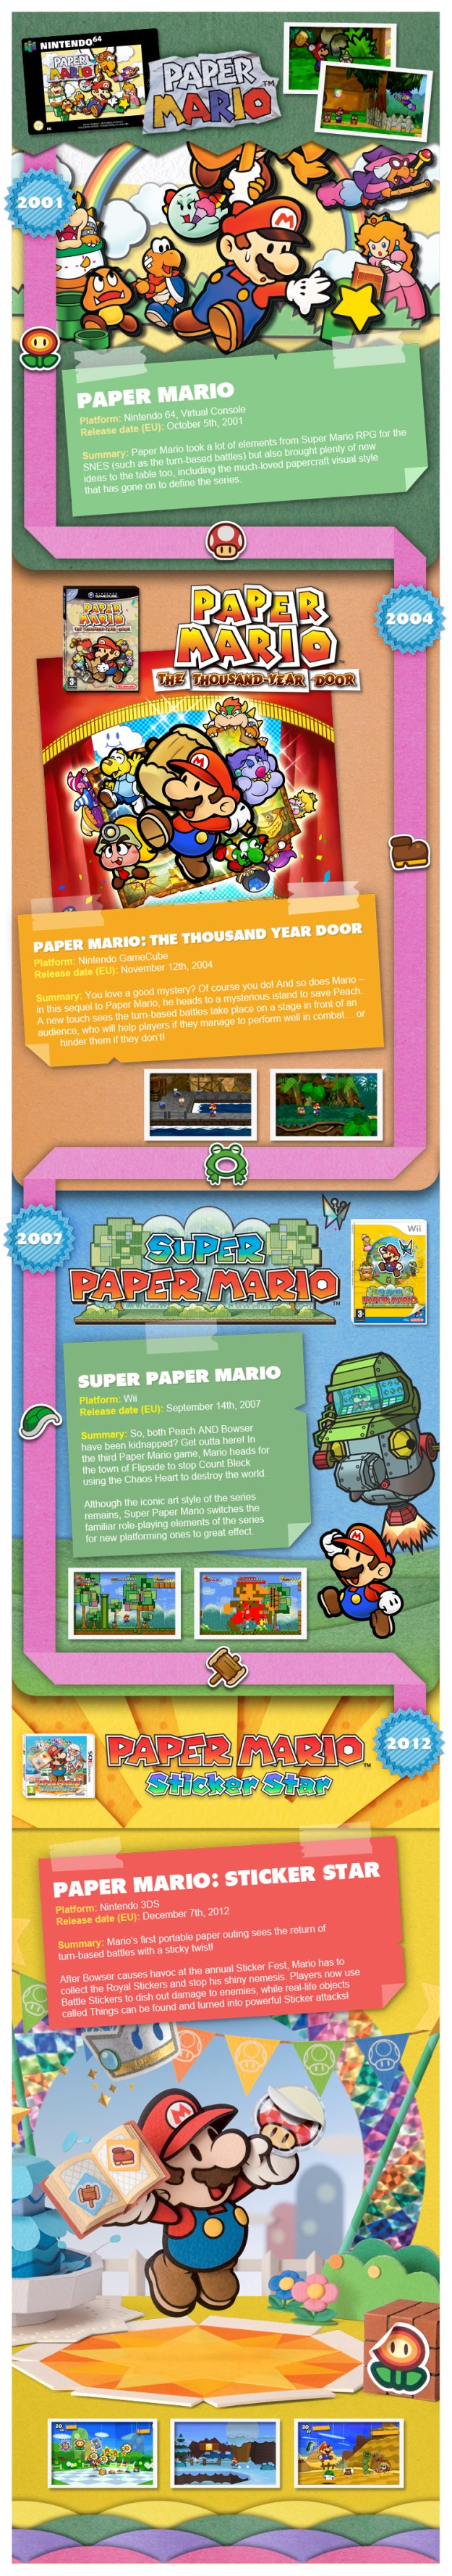 Paper_Mario_Infographic